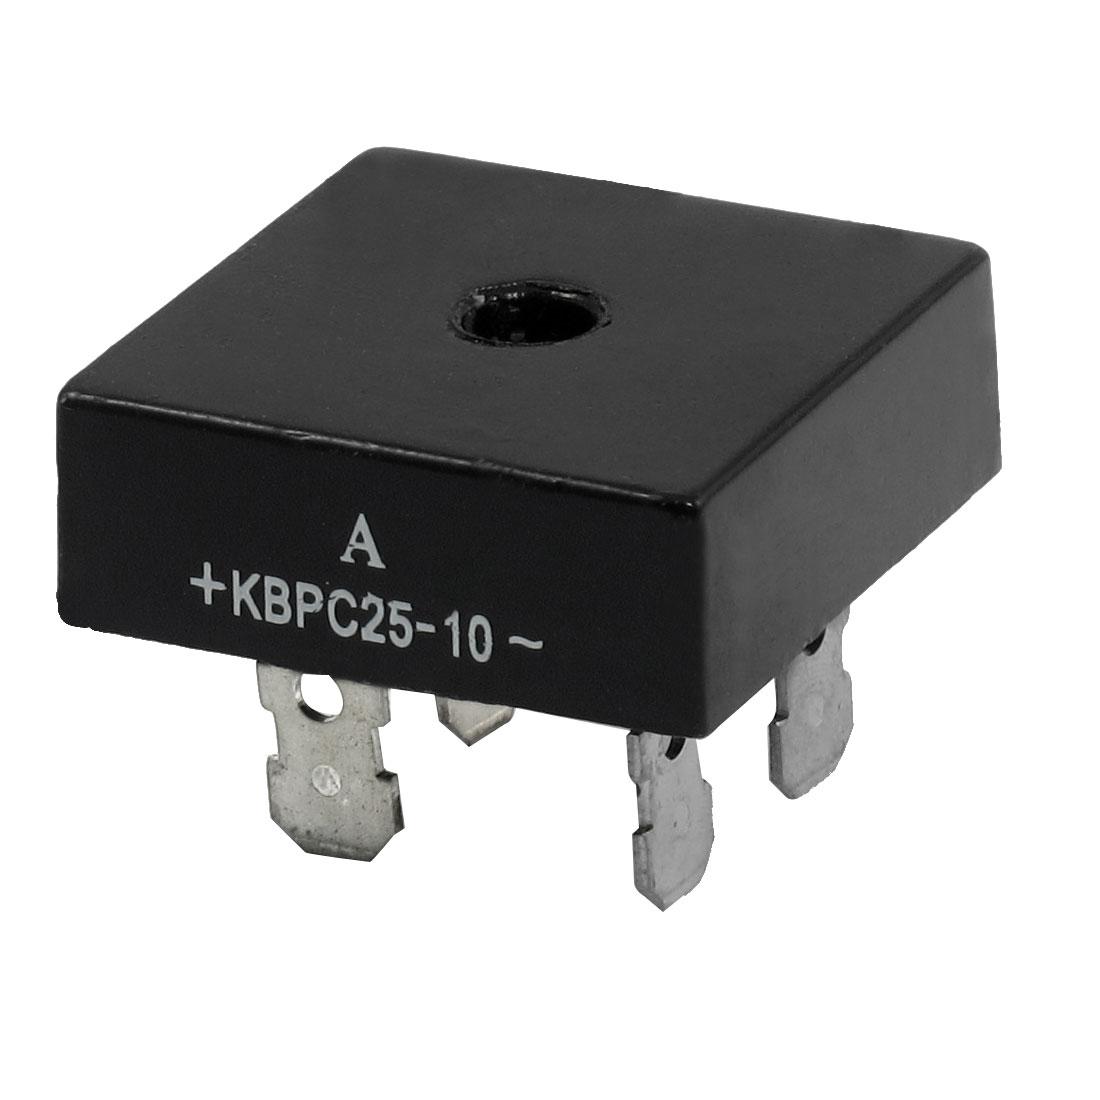 KBPC25-10 Professional Metal Case Bridge Rectifier 1000V 25A